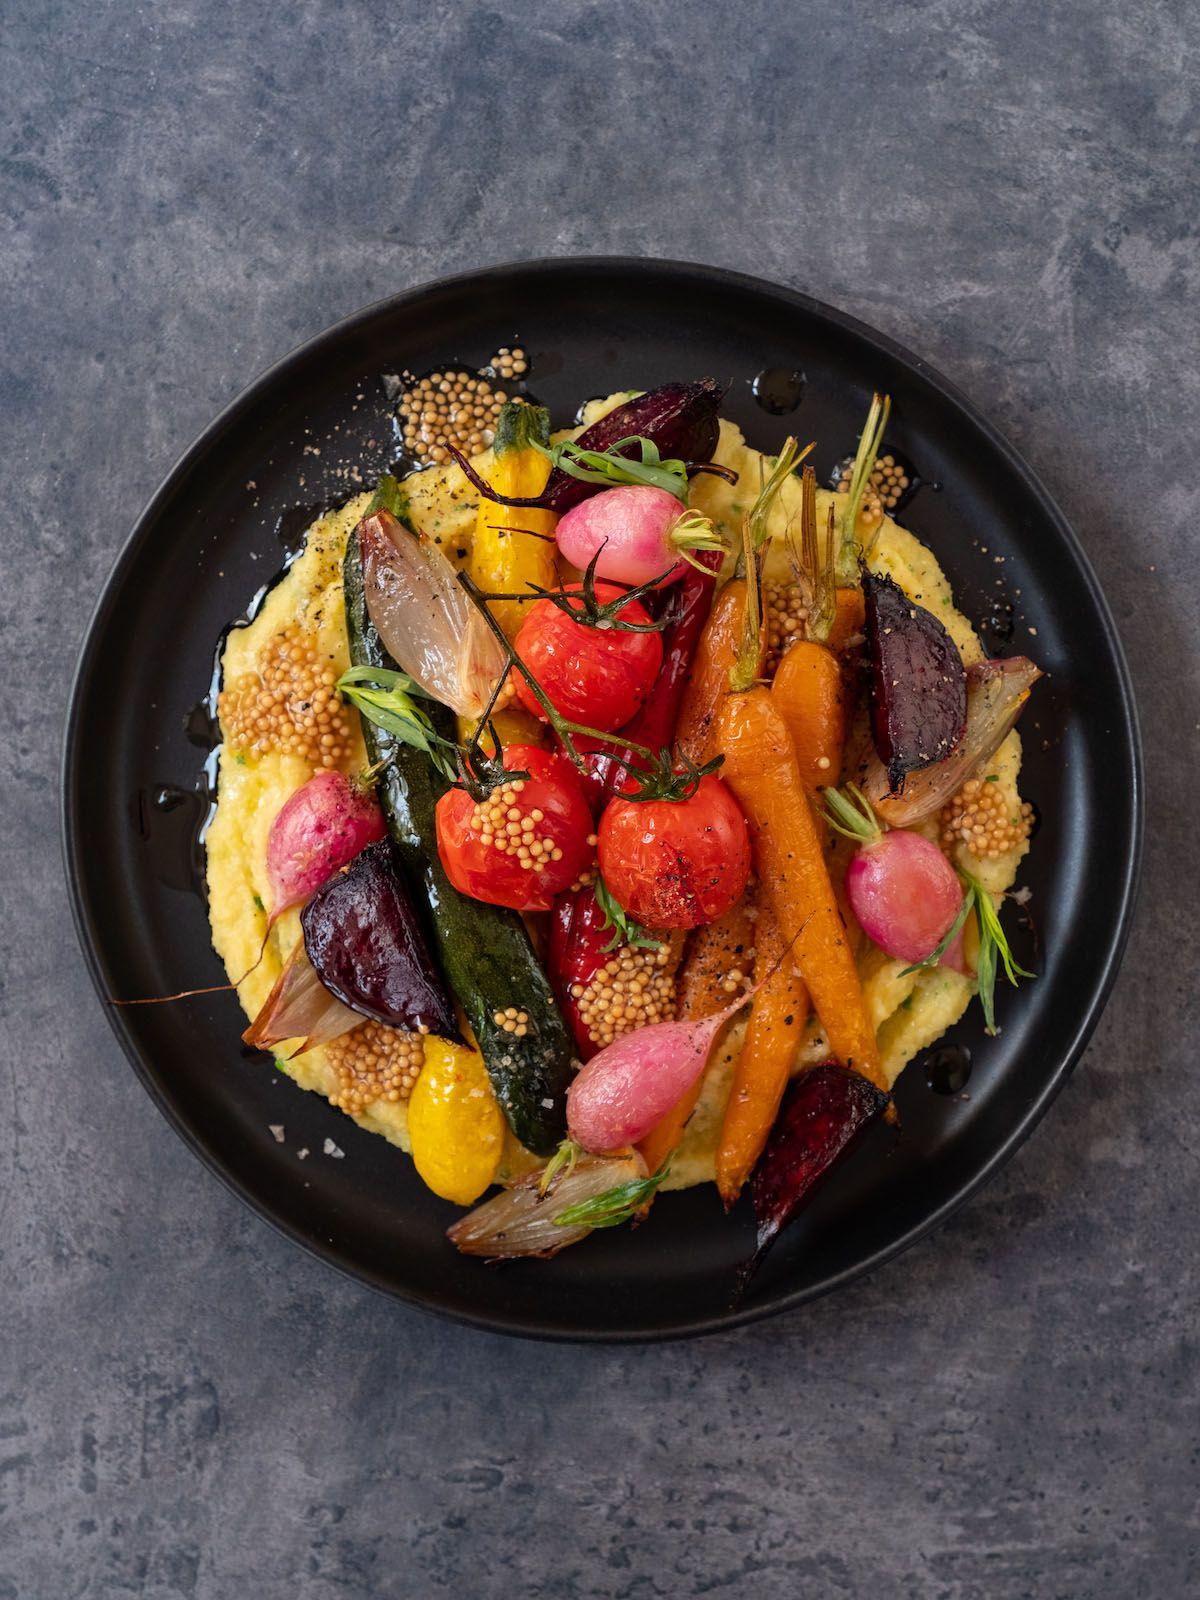 Rezept, Foodblog, Abput Fuel, Senfcaviar, Sommergemüse, Senfsaat, Polenta